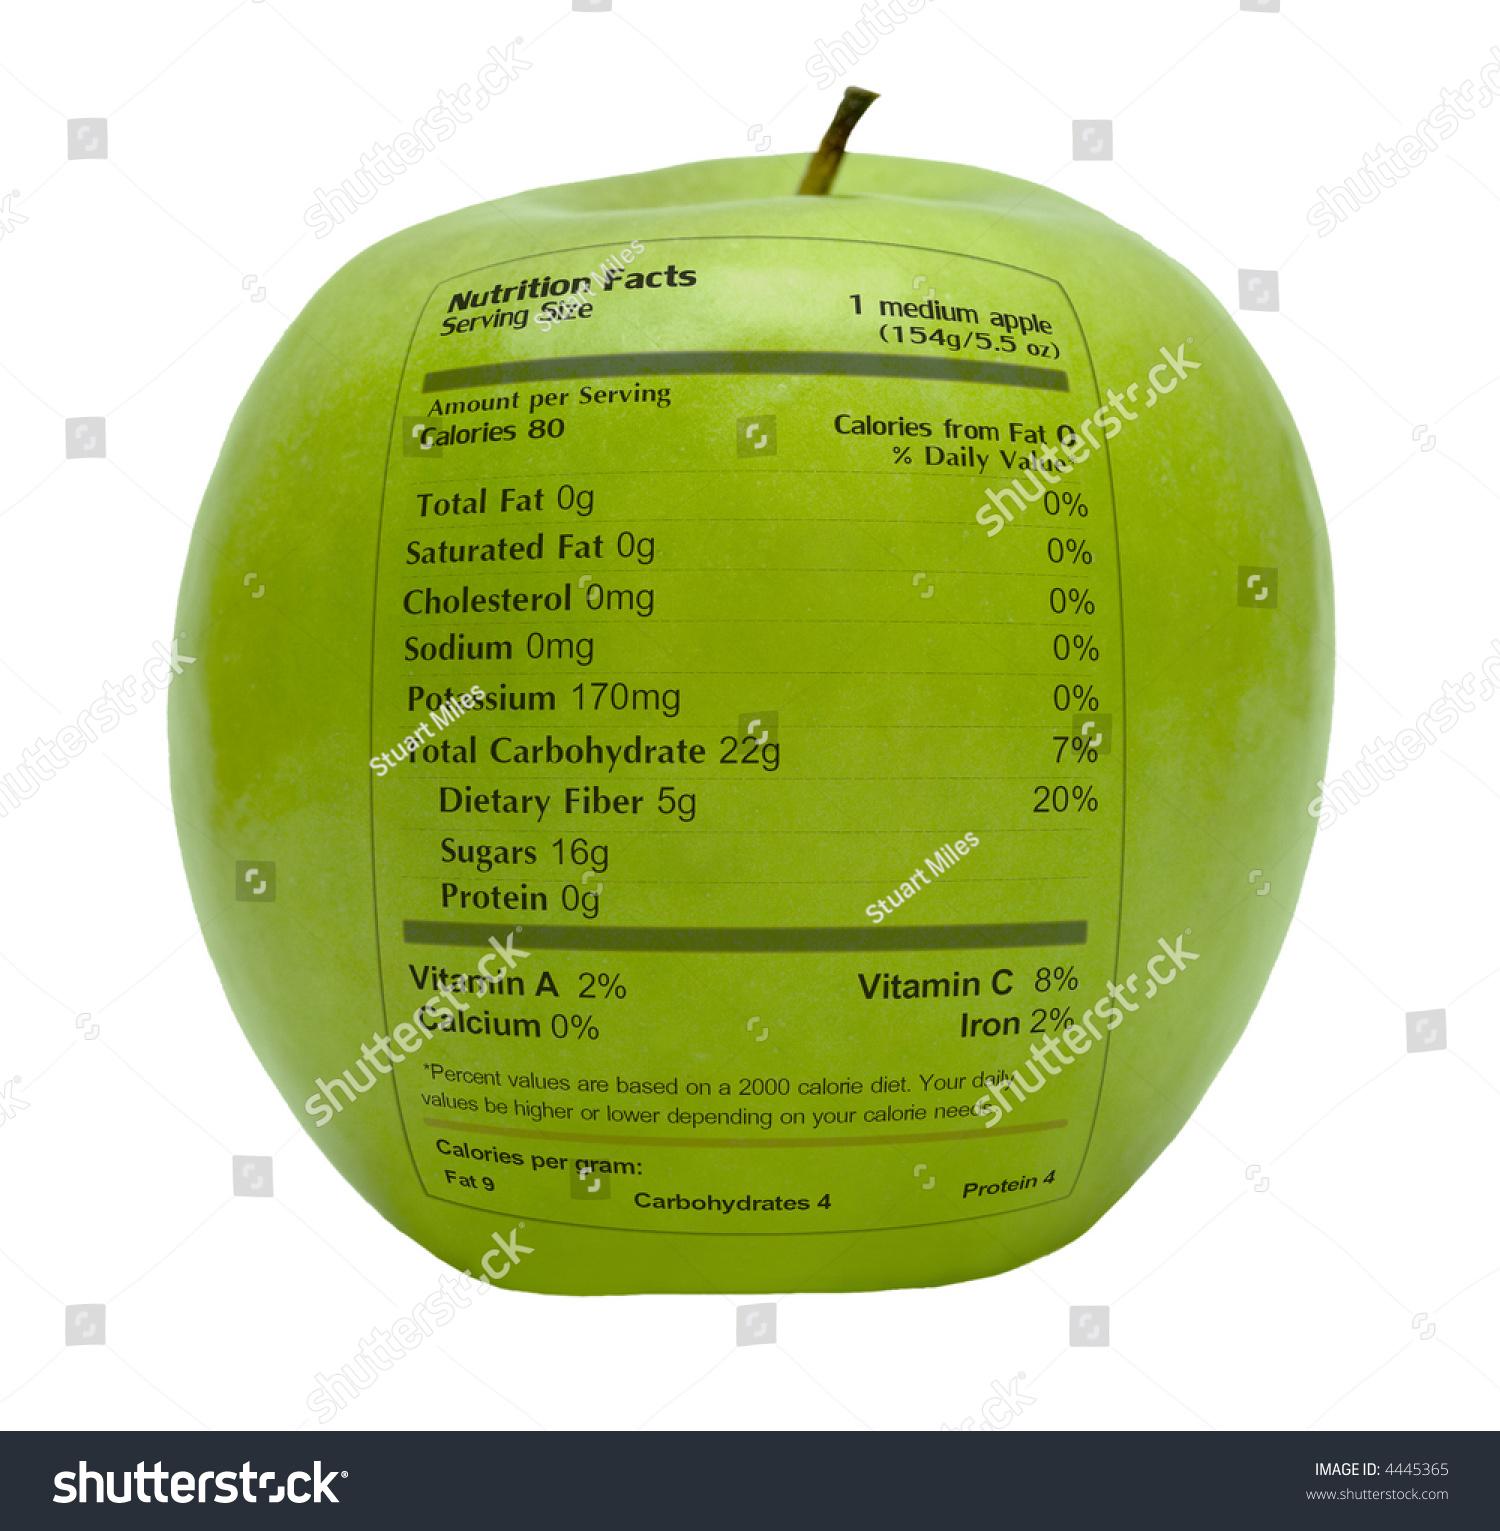 Nutrition green apple